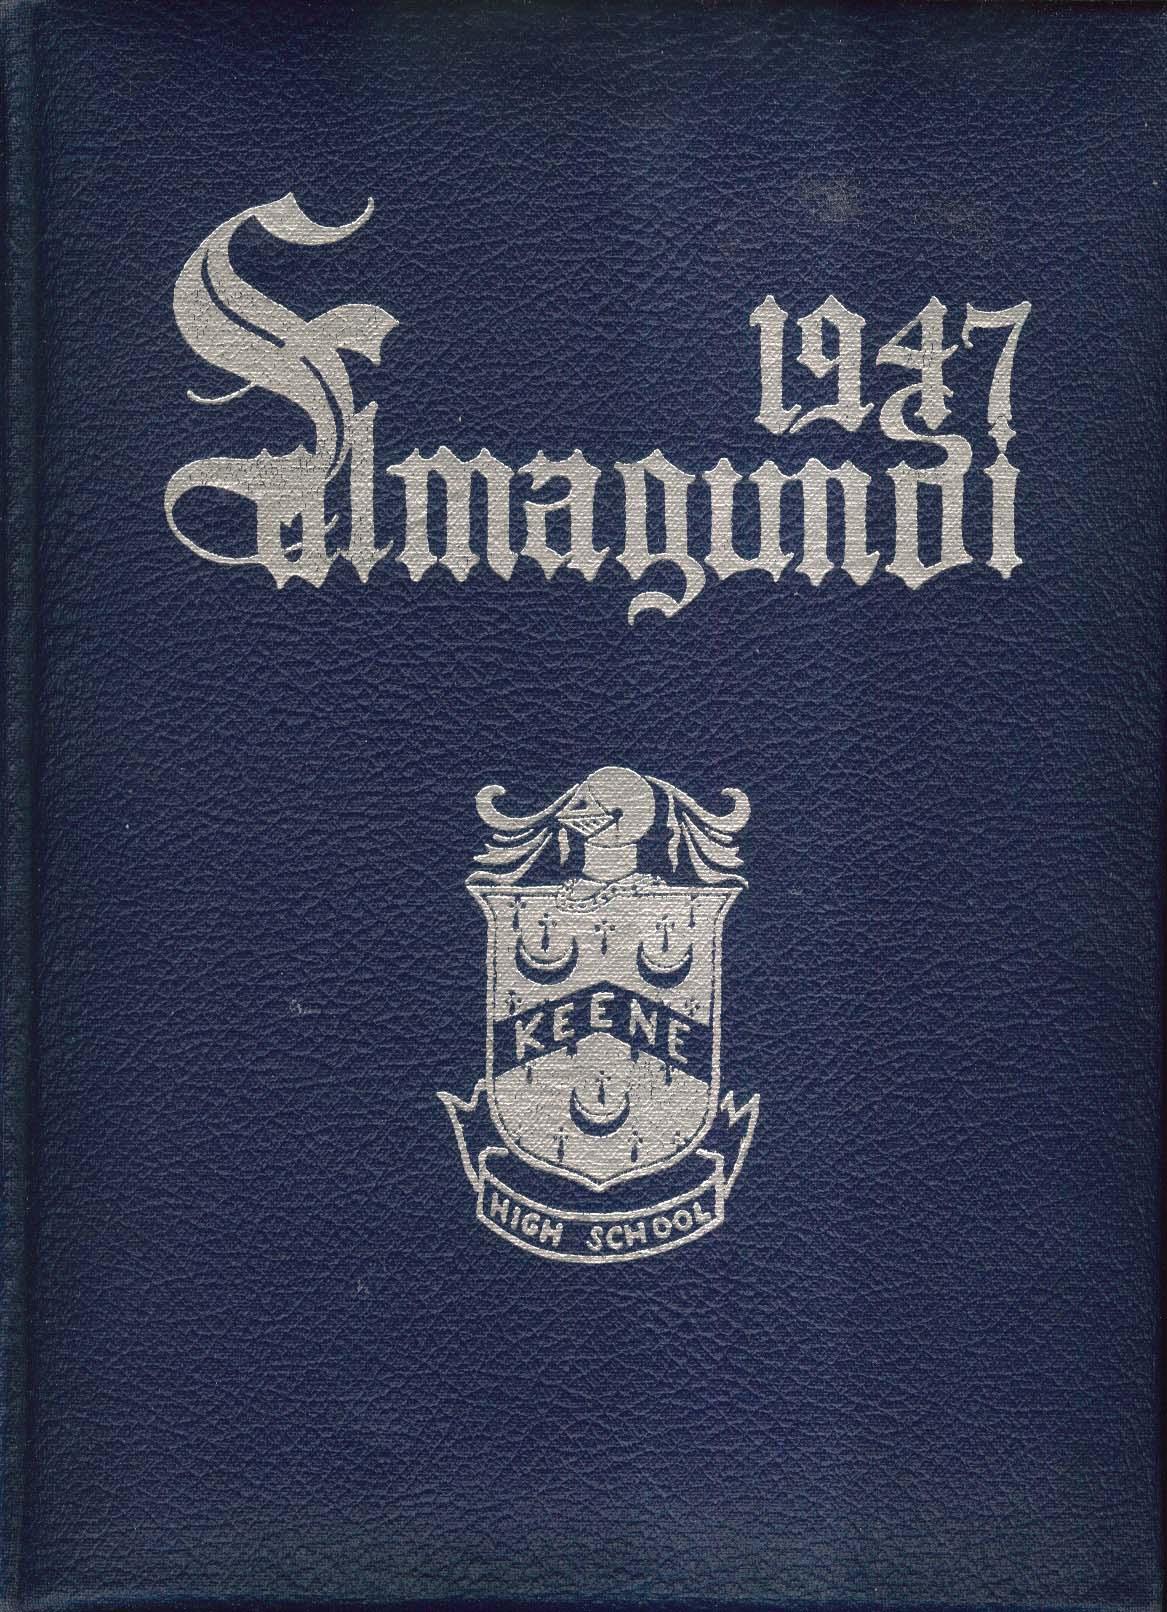 Image for 1947 Salmagundi Keene High School Yearbook Keene New Hampshire NH